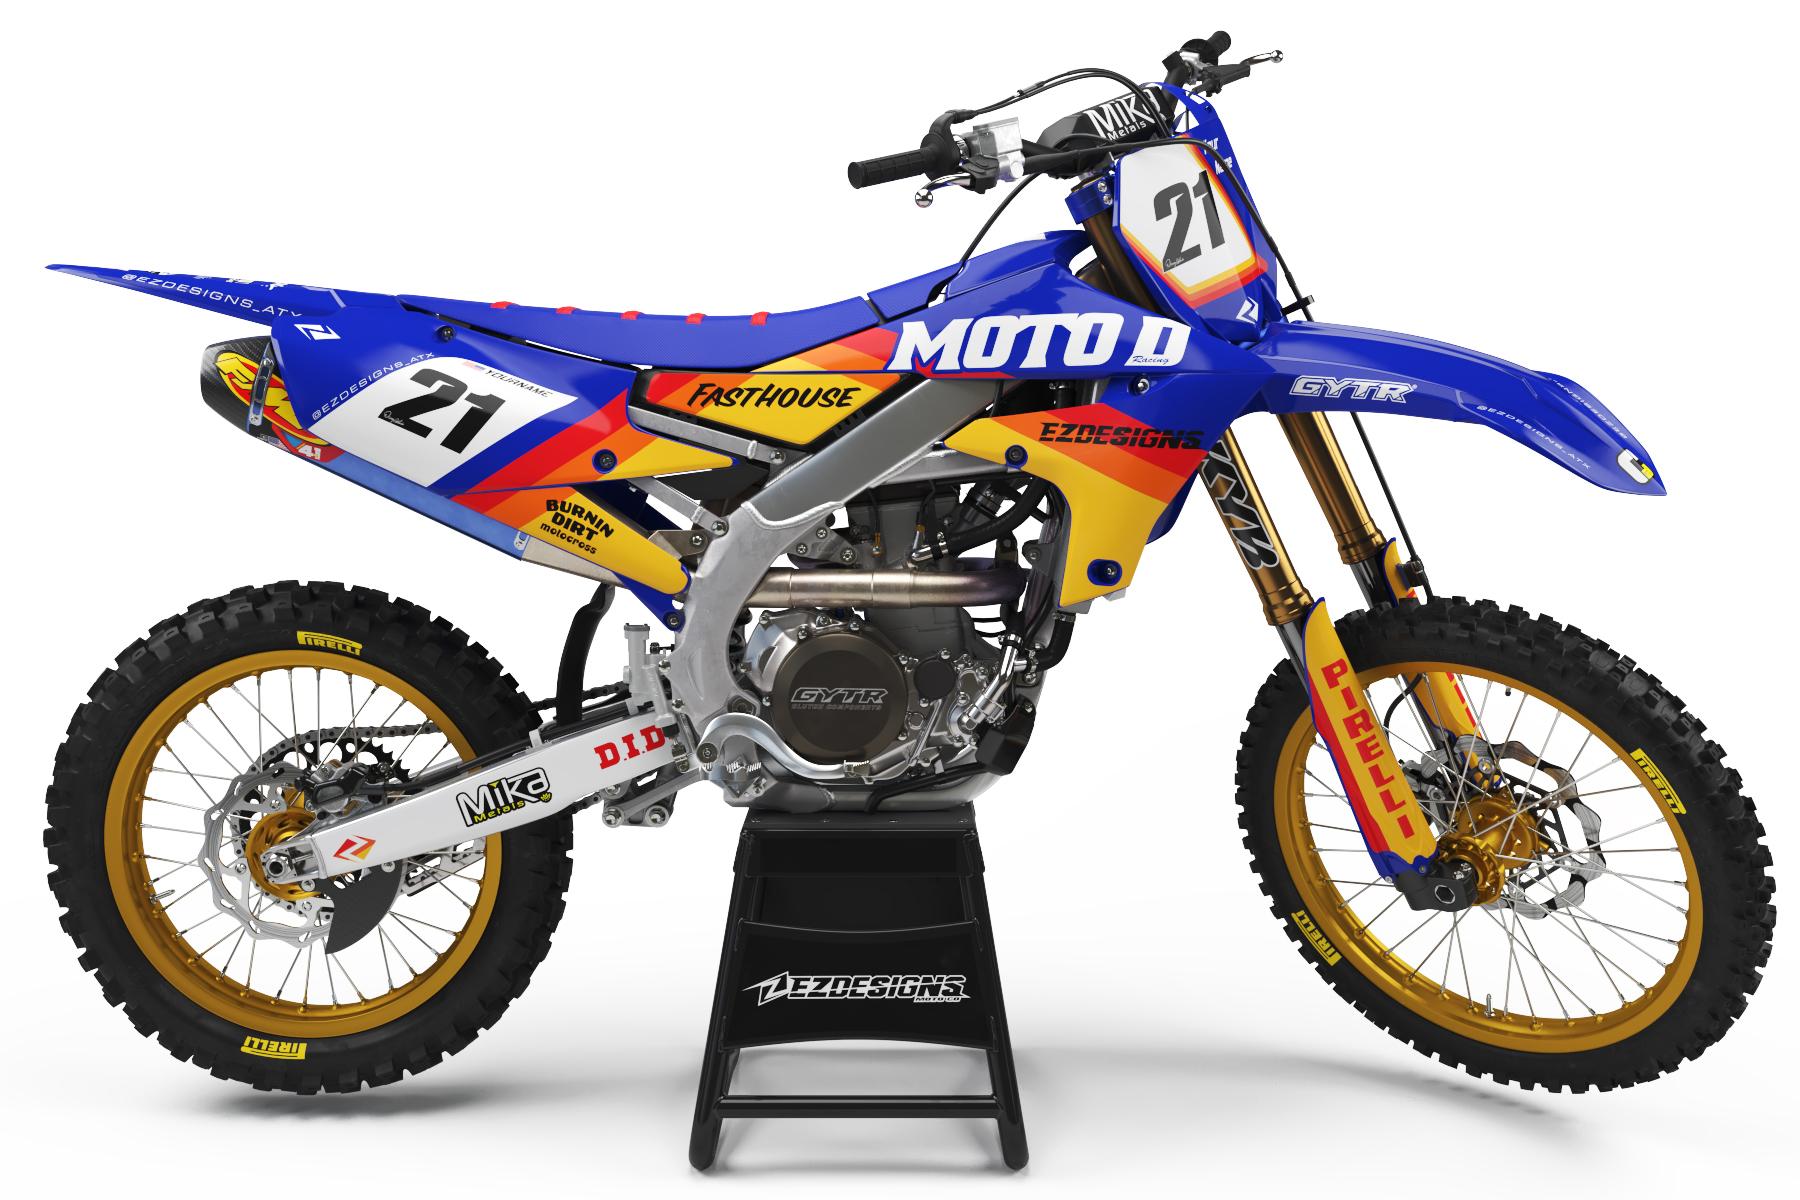 Moto D